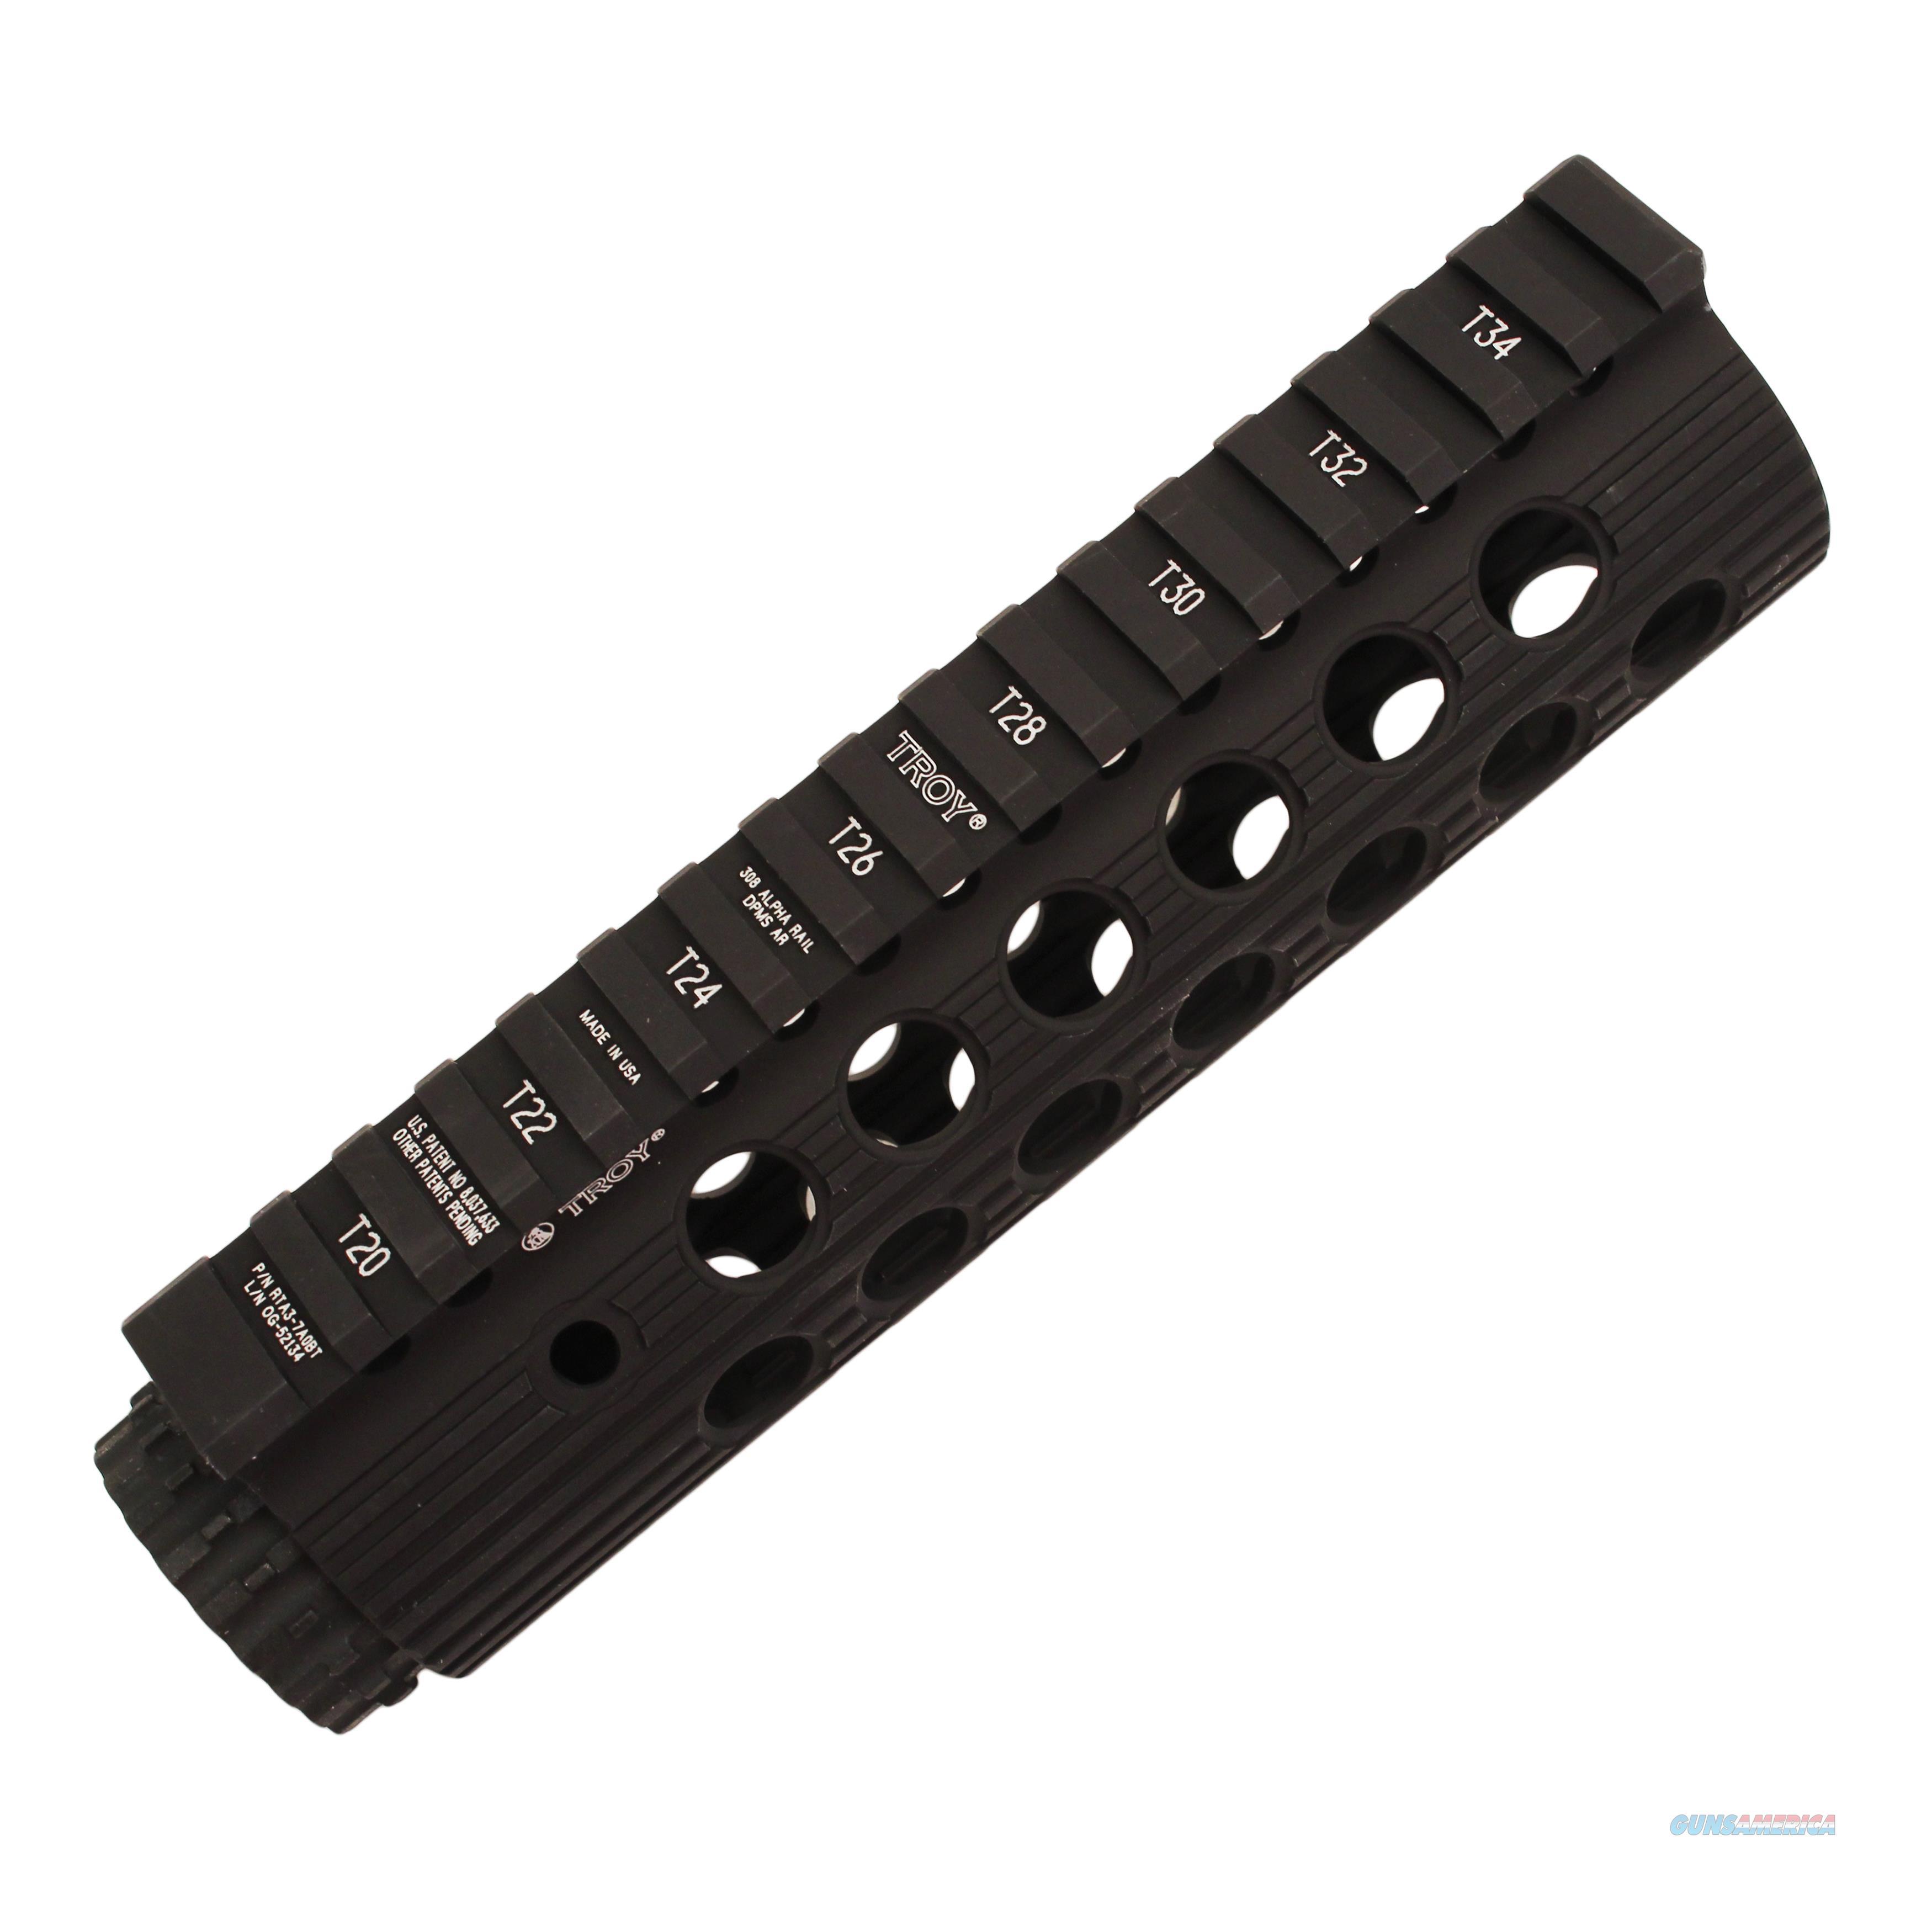 Troy Industries Inc Alpha 308 Rail, Black STRXAL37ABT01  Non-Guns > Scopes/Mounts/Rings & Optics > Mounts > Tactical Rail Components